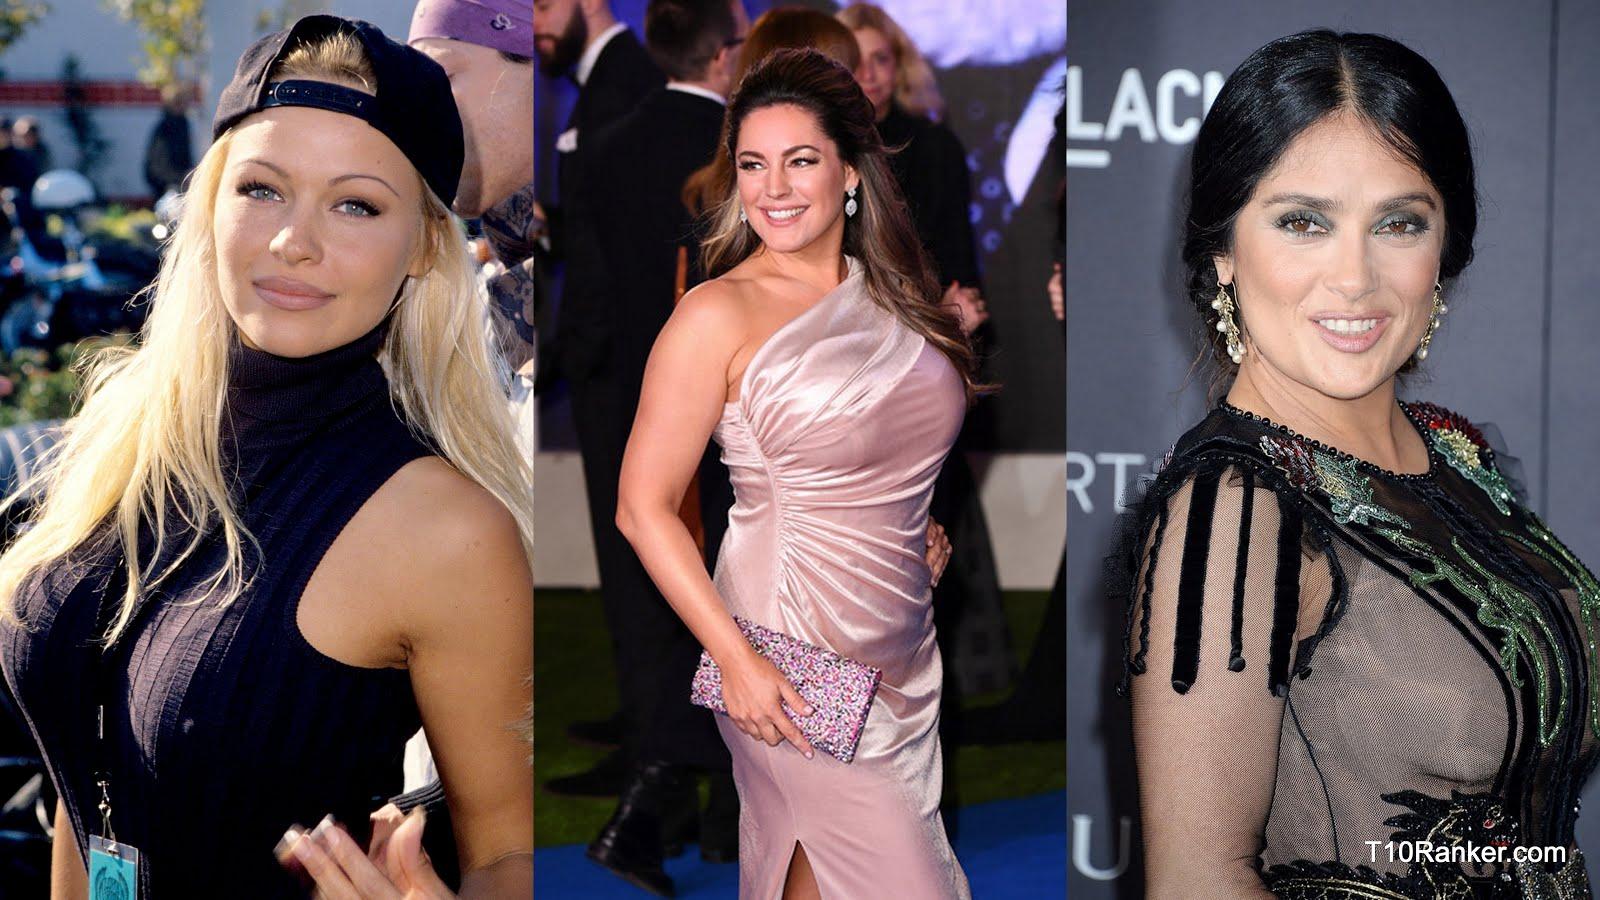 Teen actresses with huge boobs